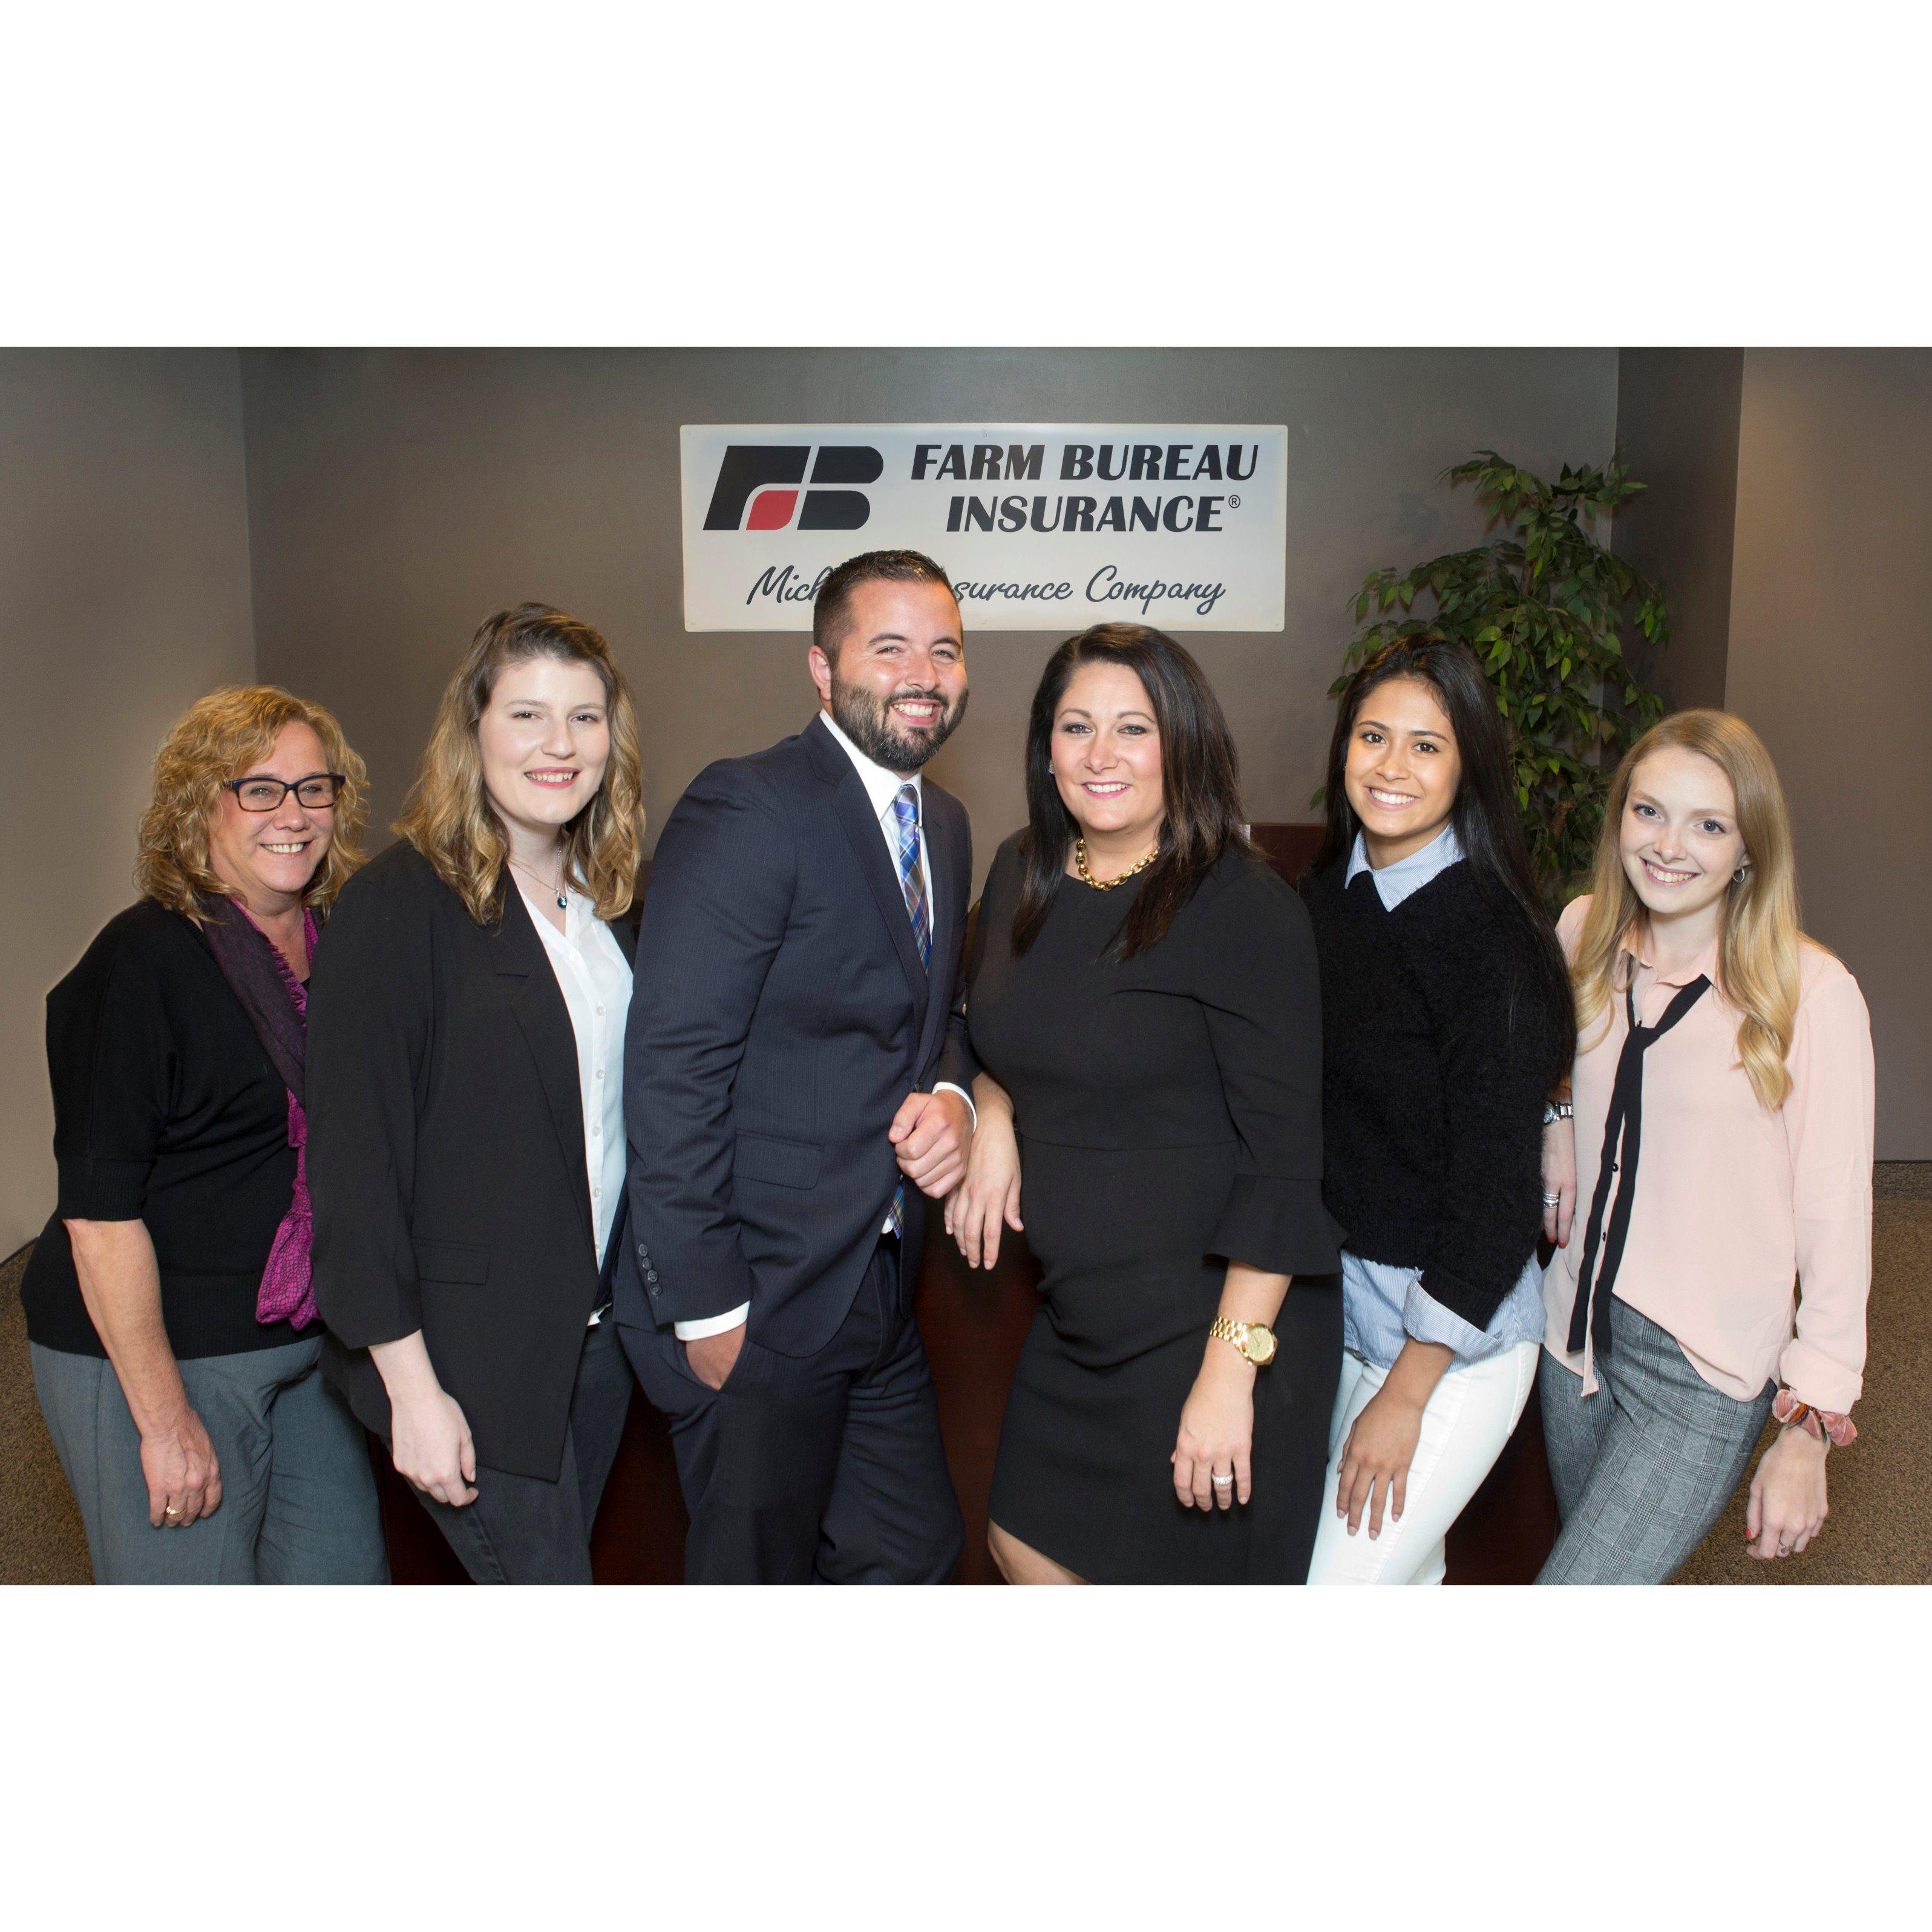 Farm Bureau Insurance  - The Milner Agency